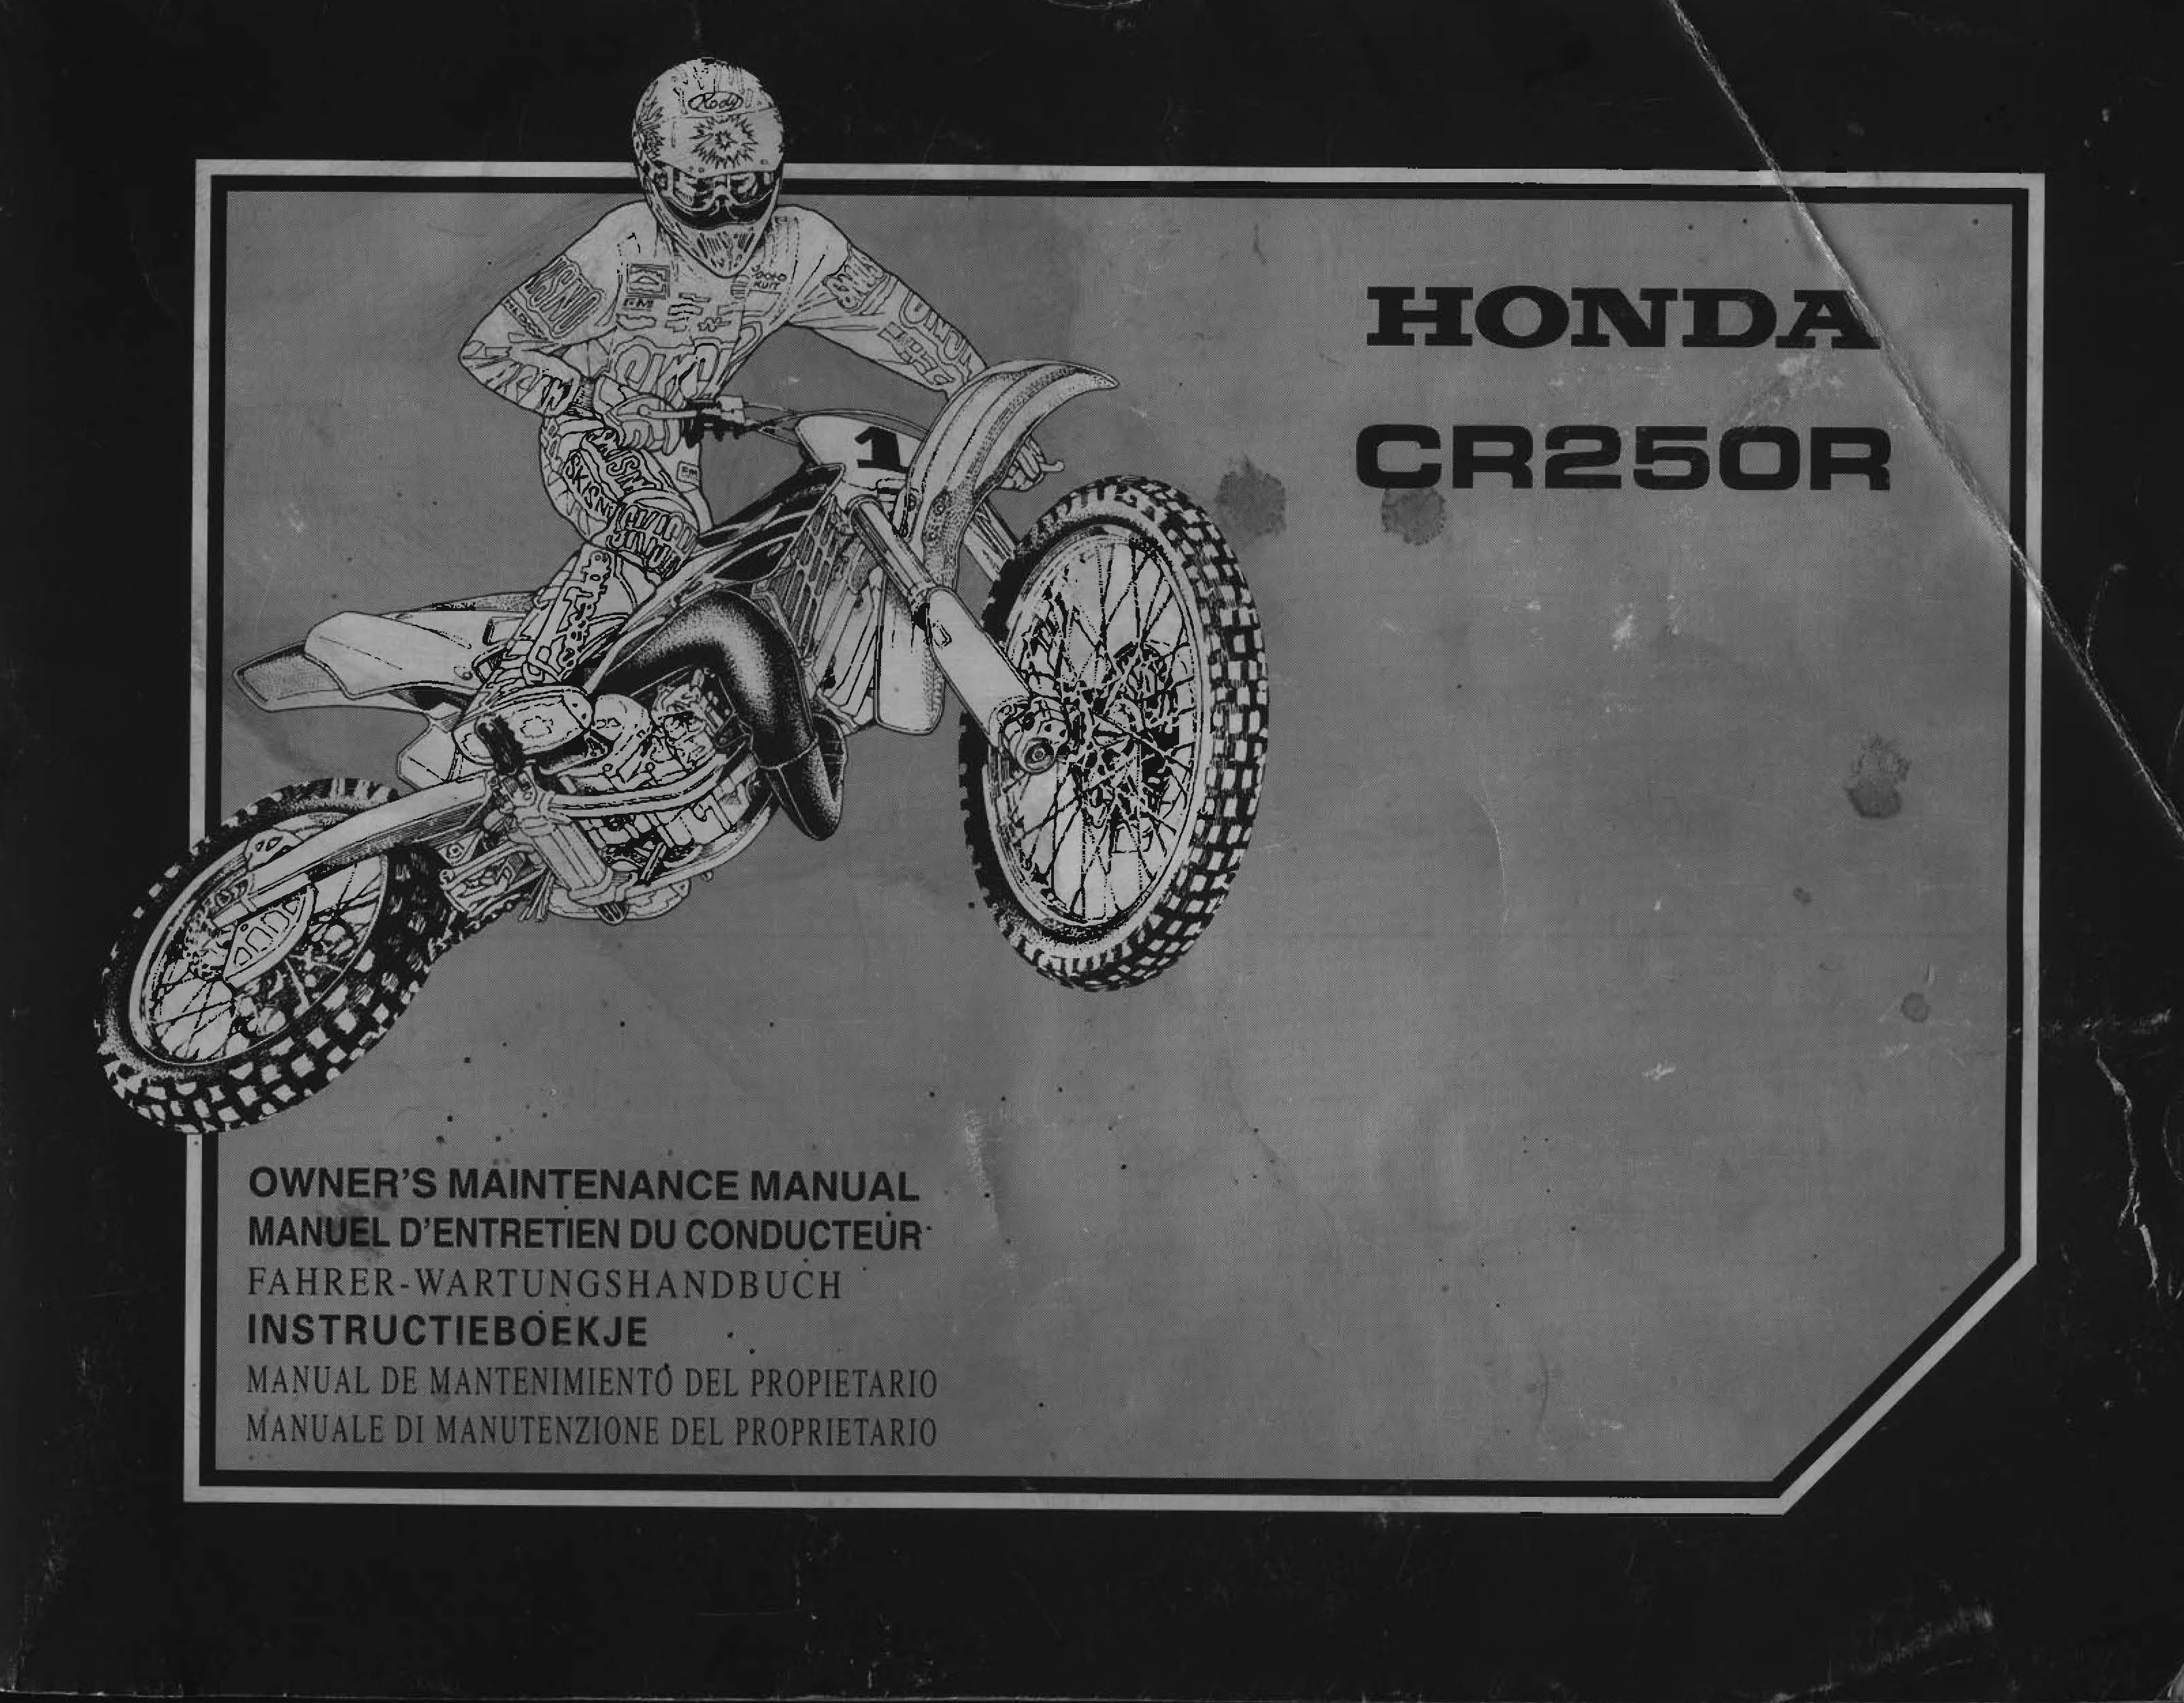 Workshop manual for Honda CR250R (2000) (Multi-language)